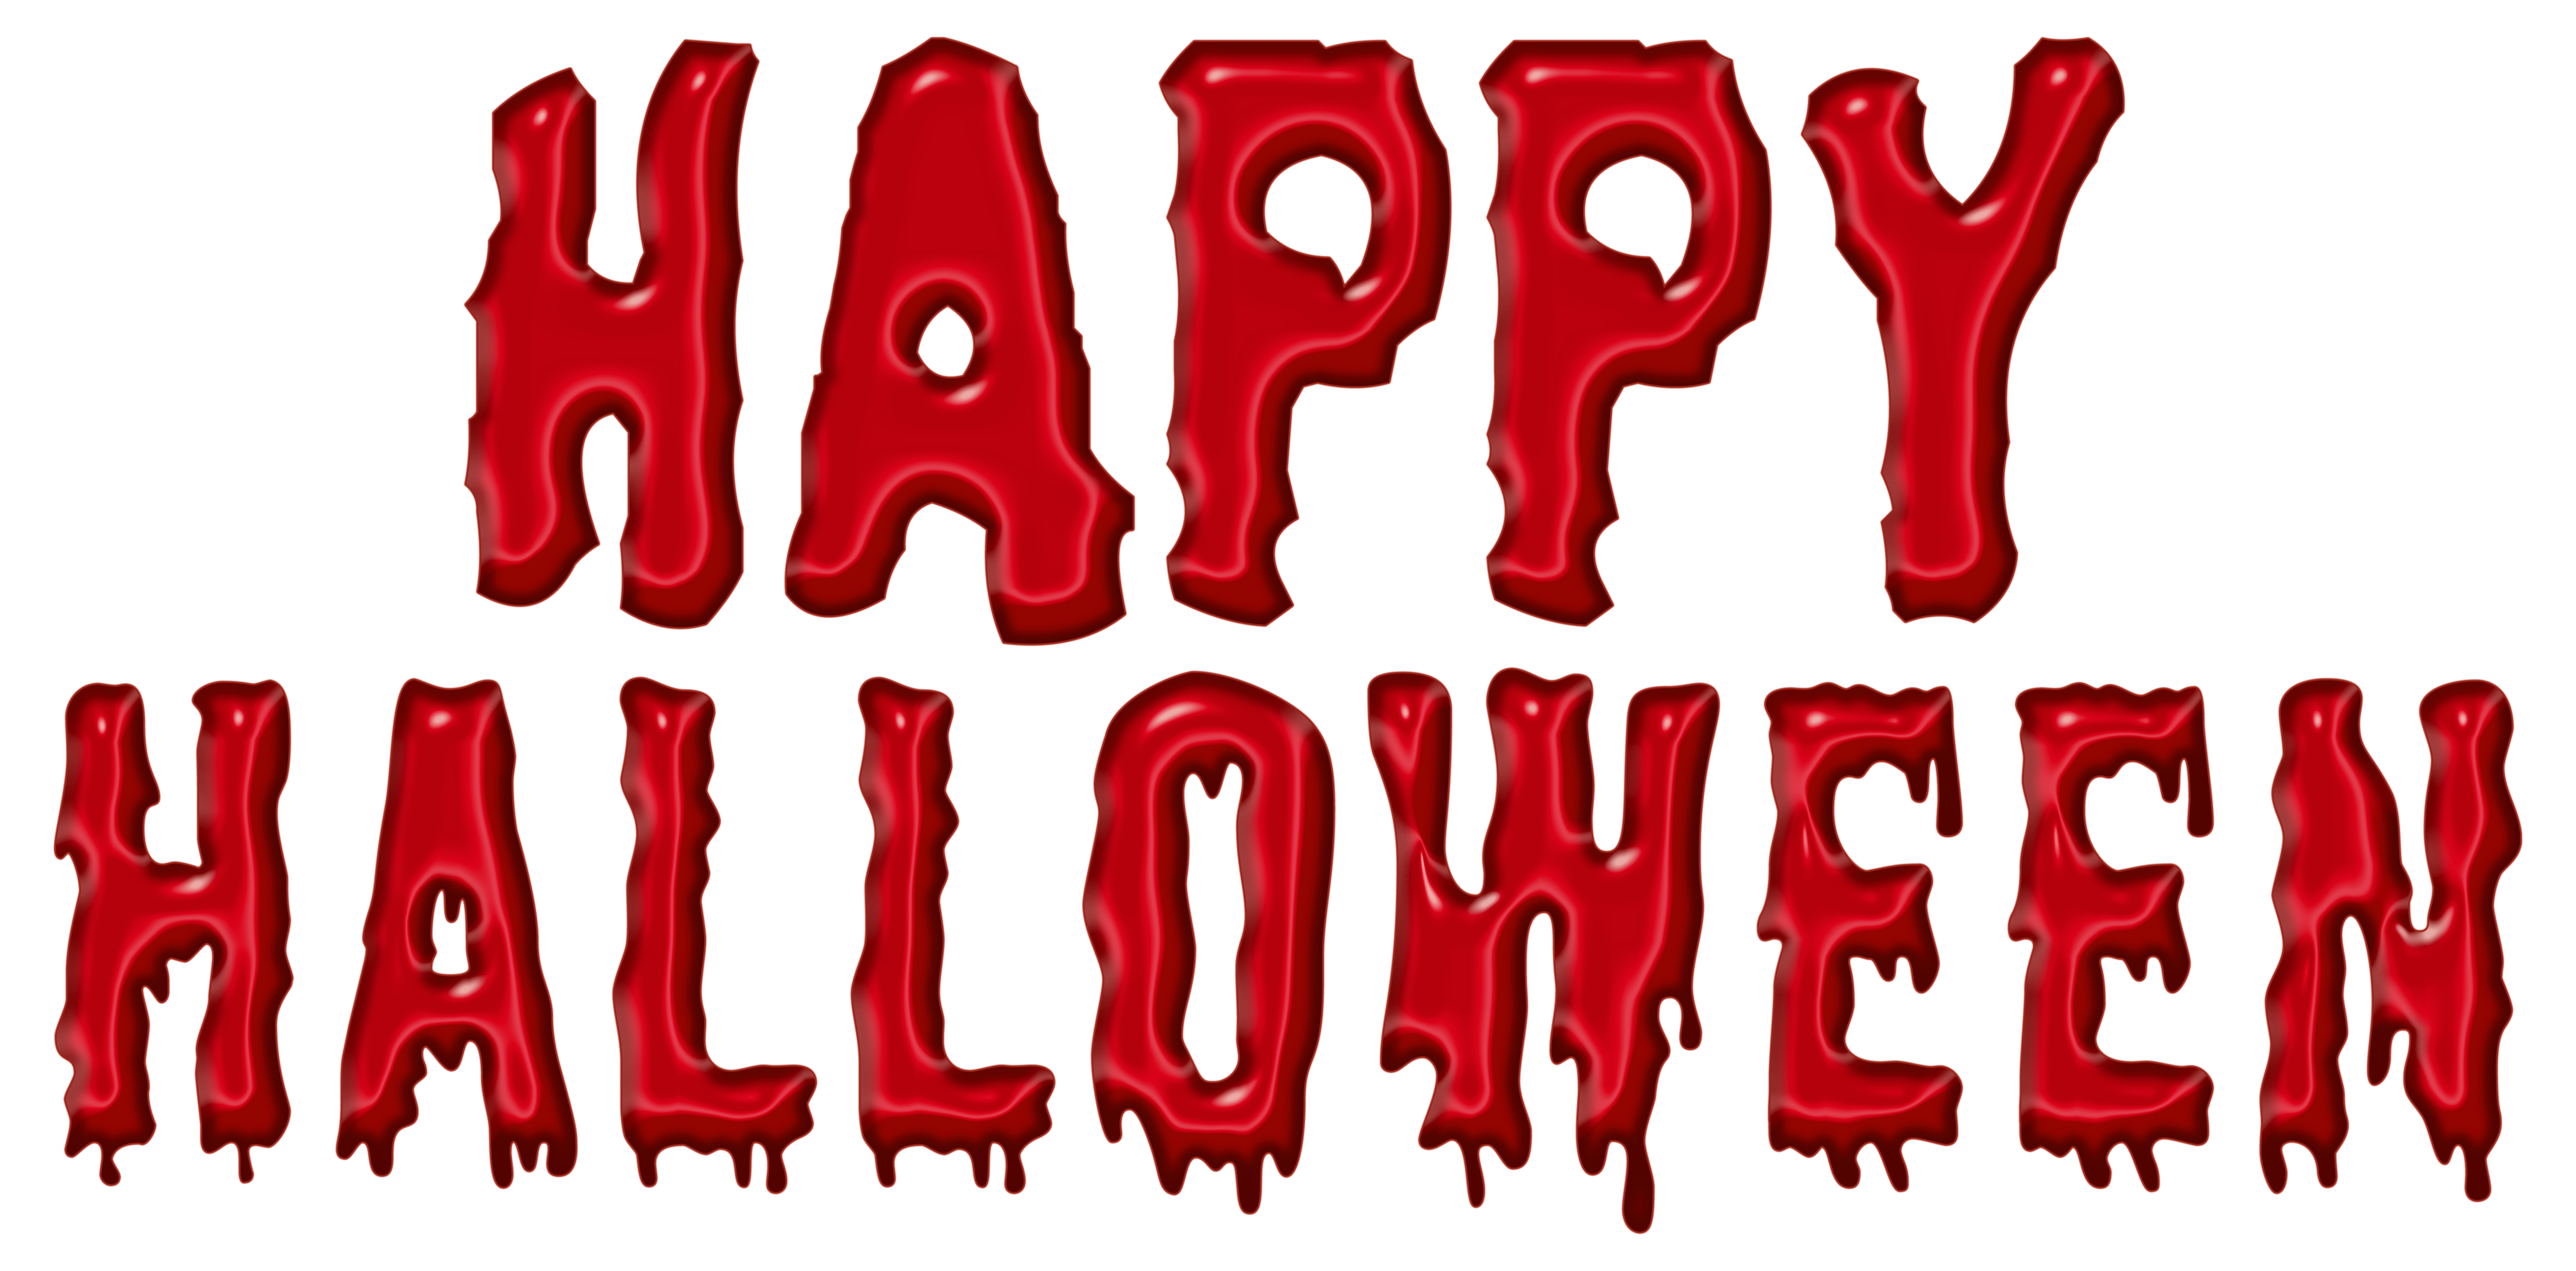 Handprint clipart blood Typat Halloween Yopriceville Images of